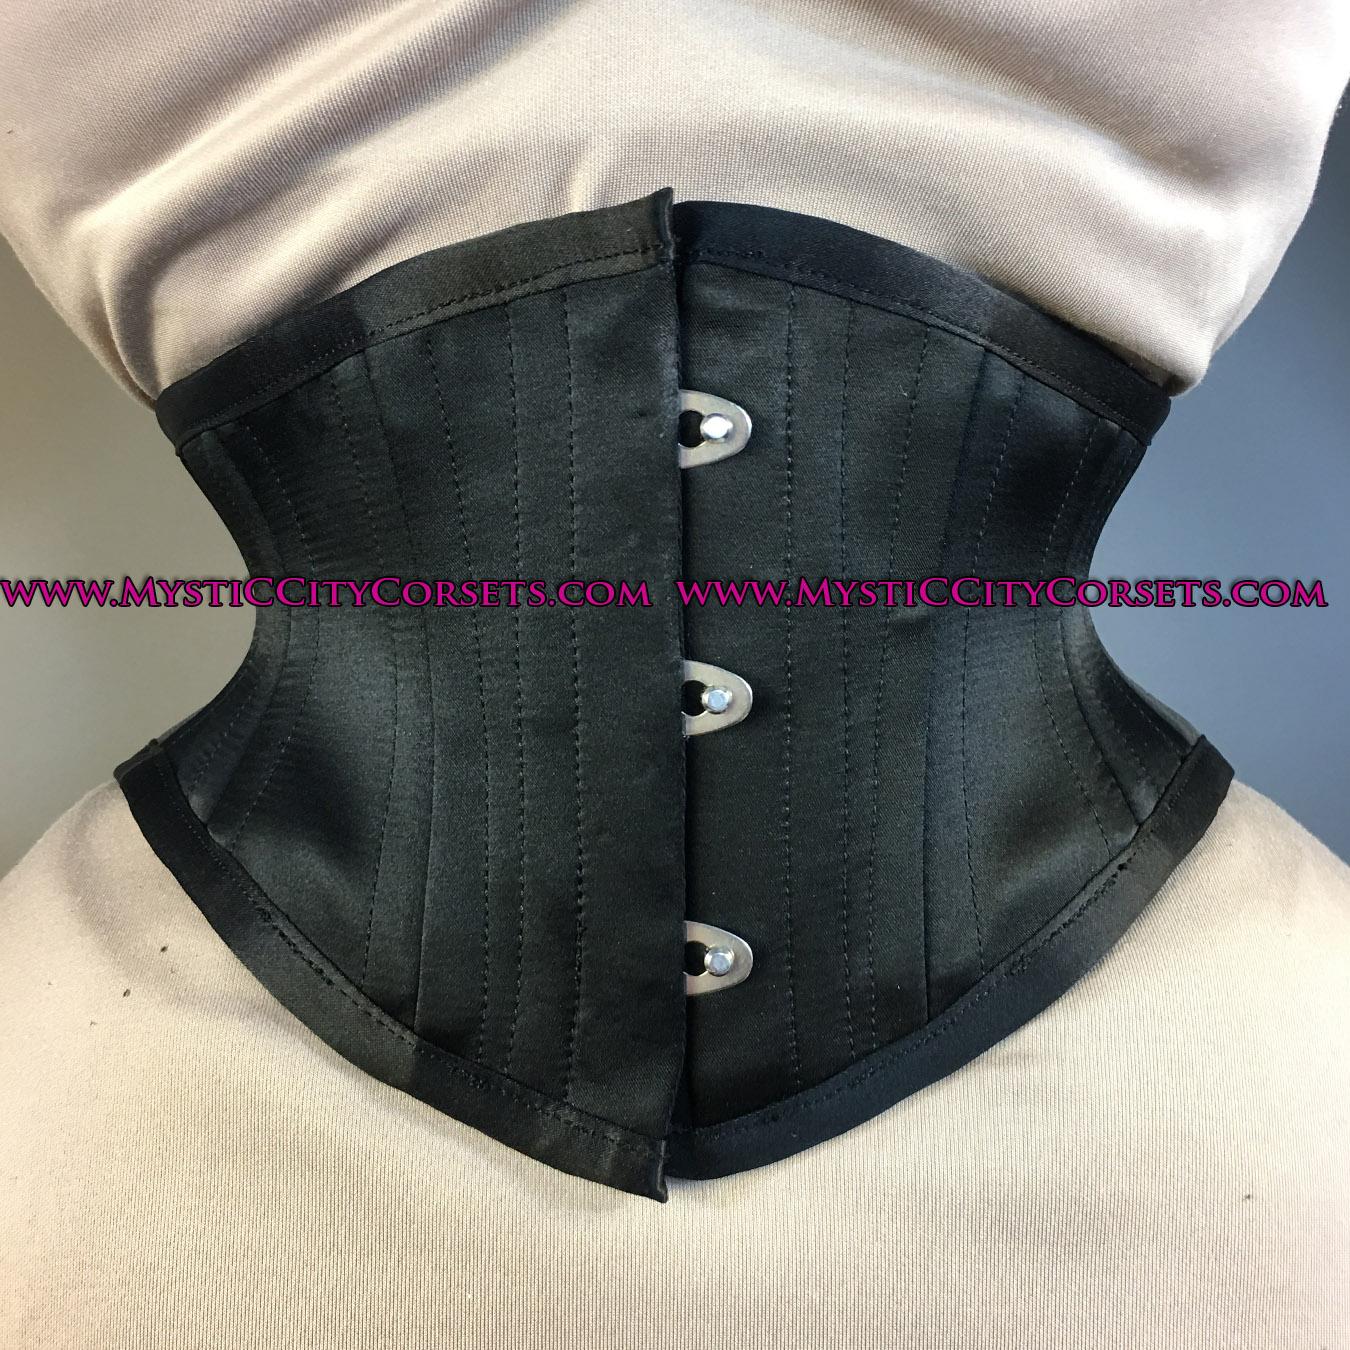 NEW Black  Waisttraining Tightlacing Fitness Sports Trainer Mesh Corset Steel Bone Underbust